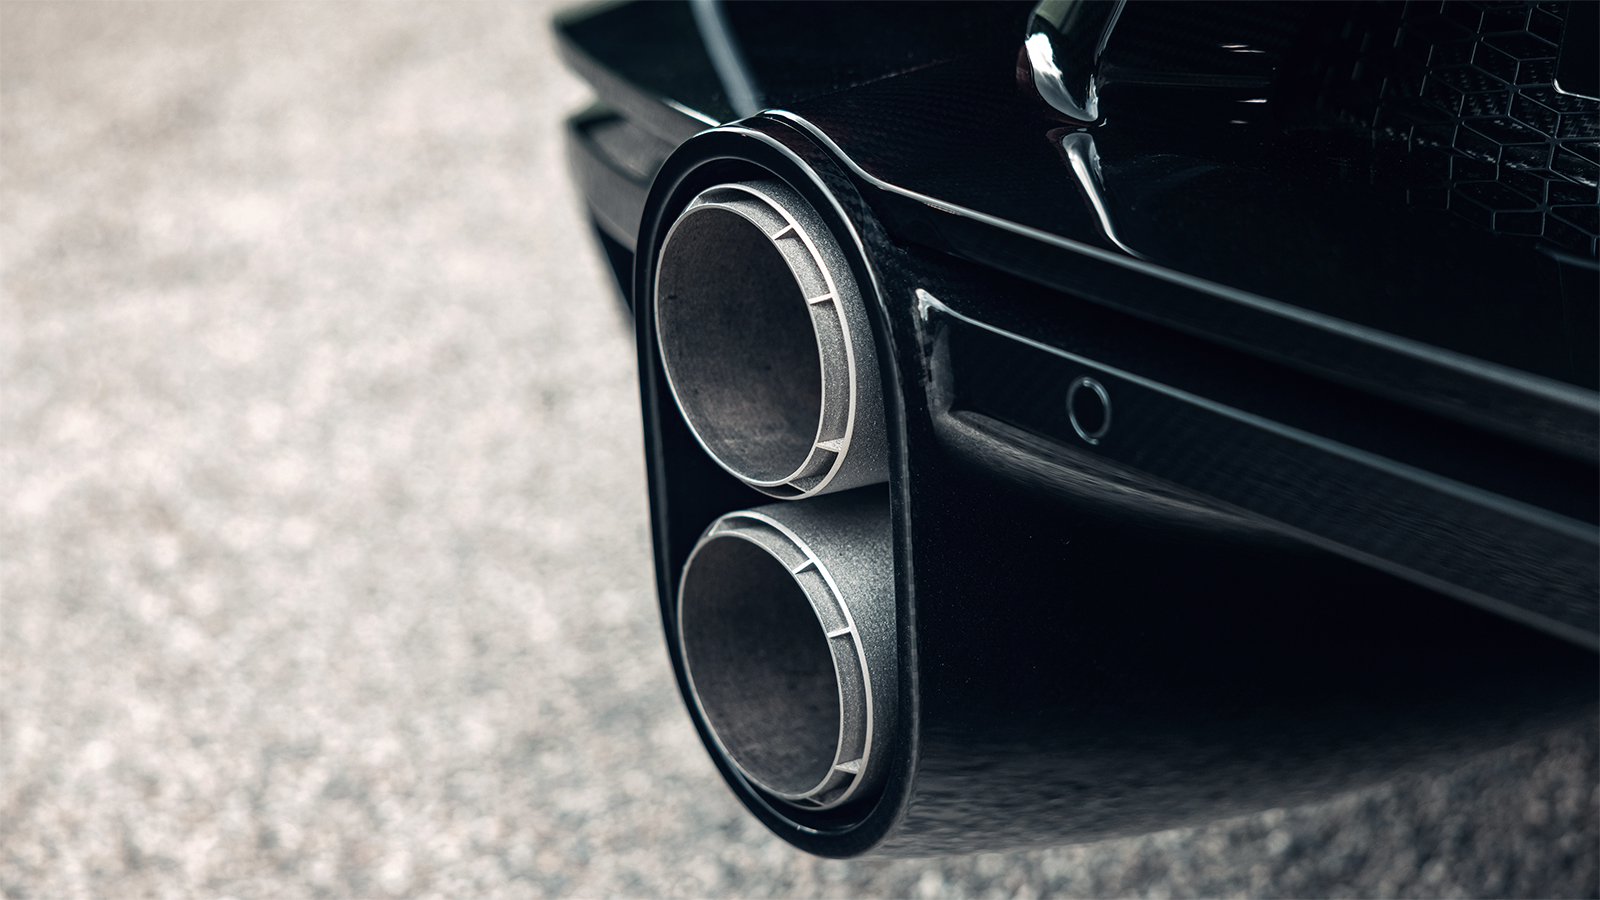 03-07_bugatti_chiron_super_sport_molsheim_front_rear_exhaust.jpeg